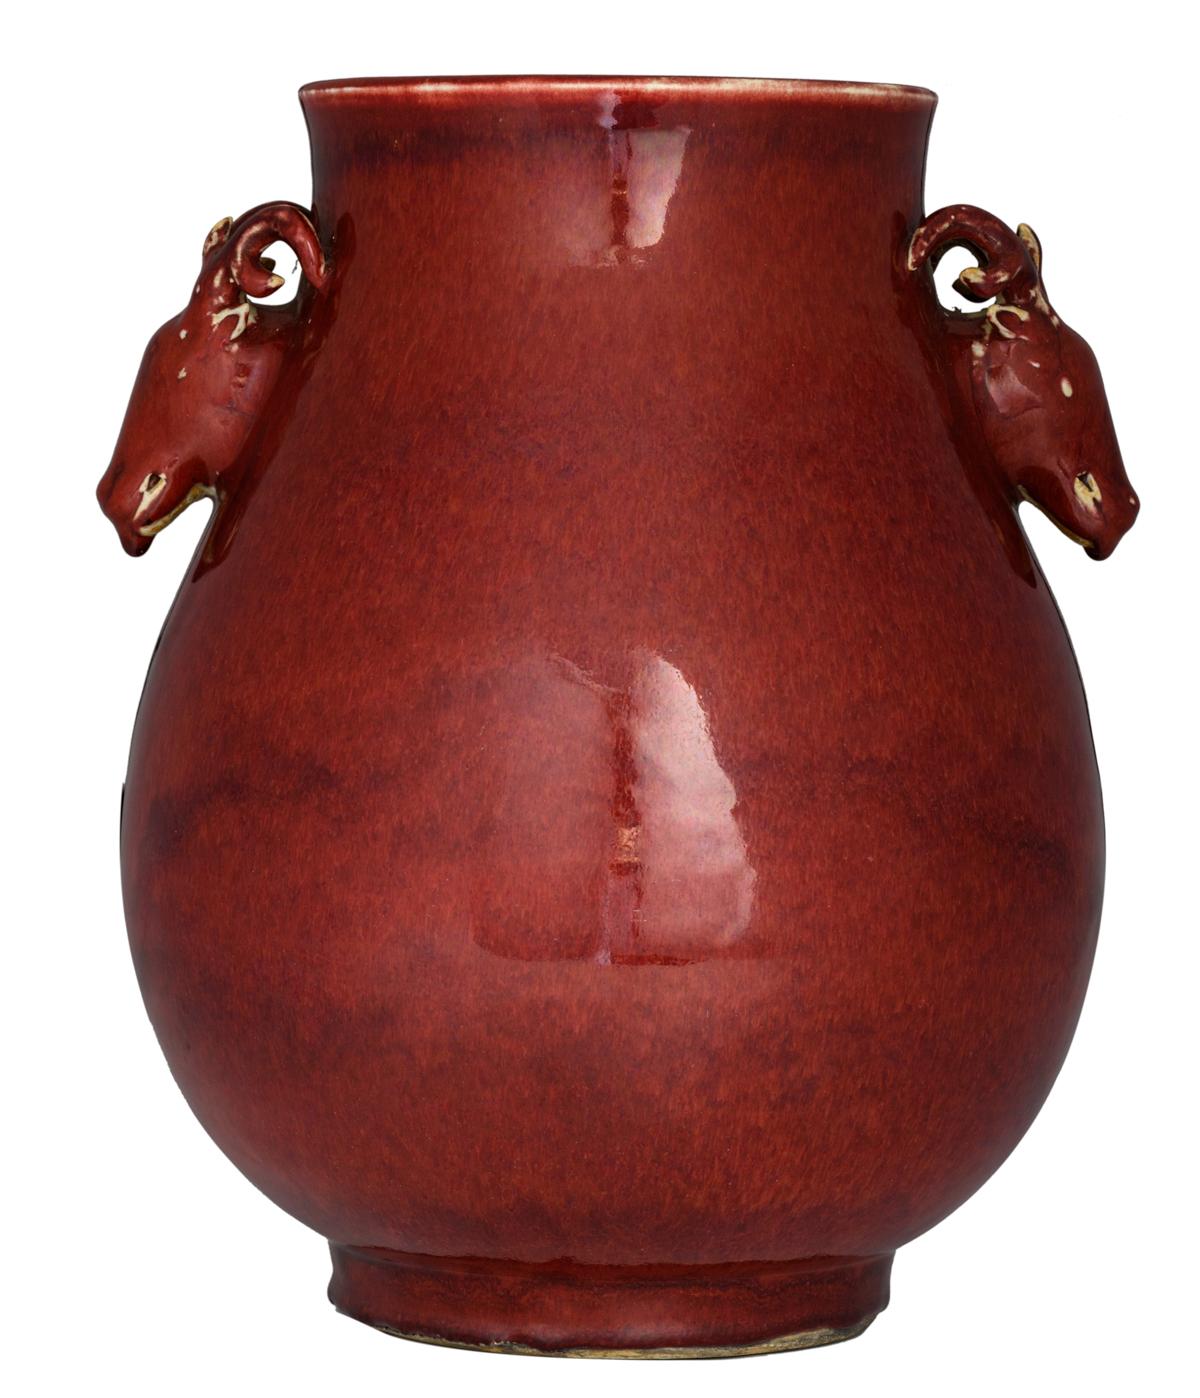 Lot 18 - A Chinese flambé-glazed hu vase with deer shaped handles, H 40 cm